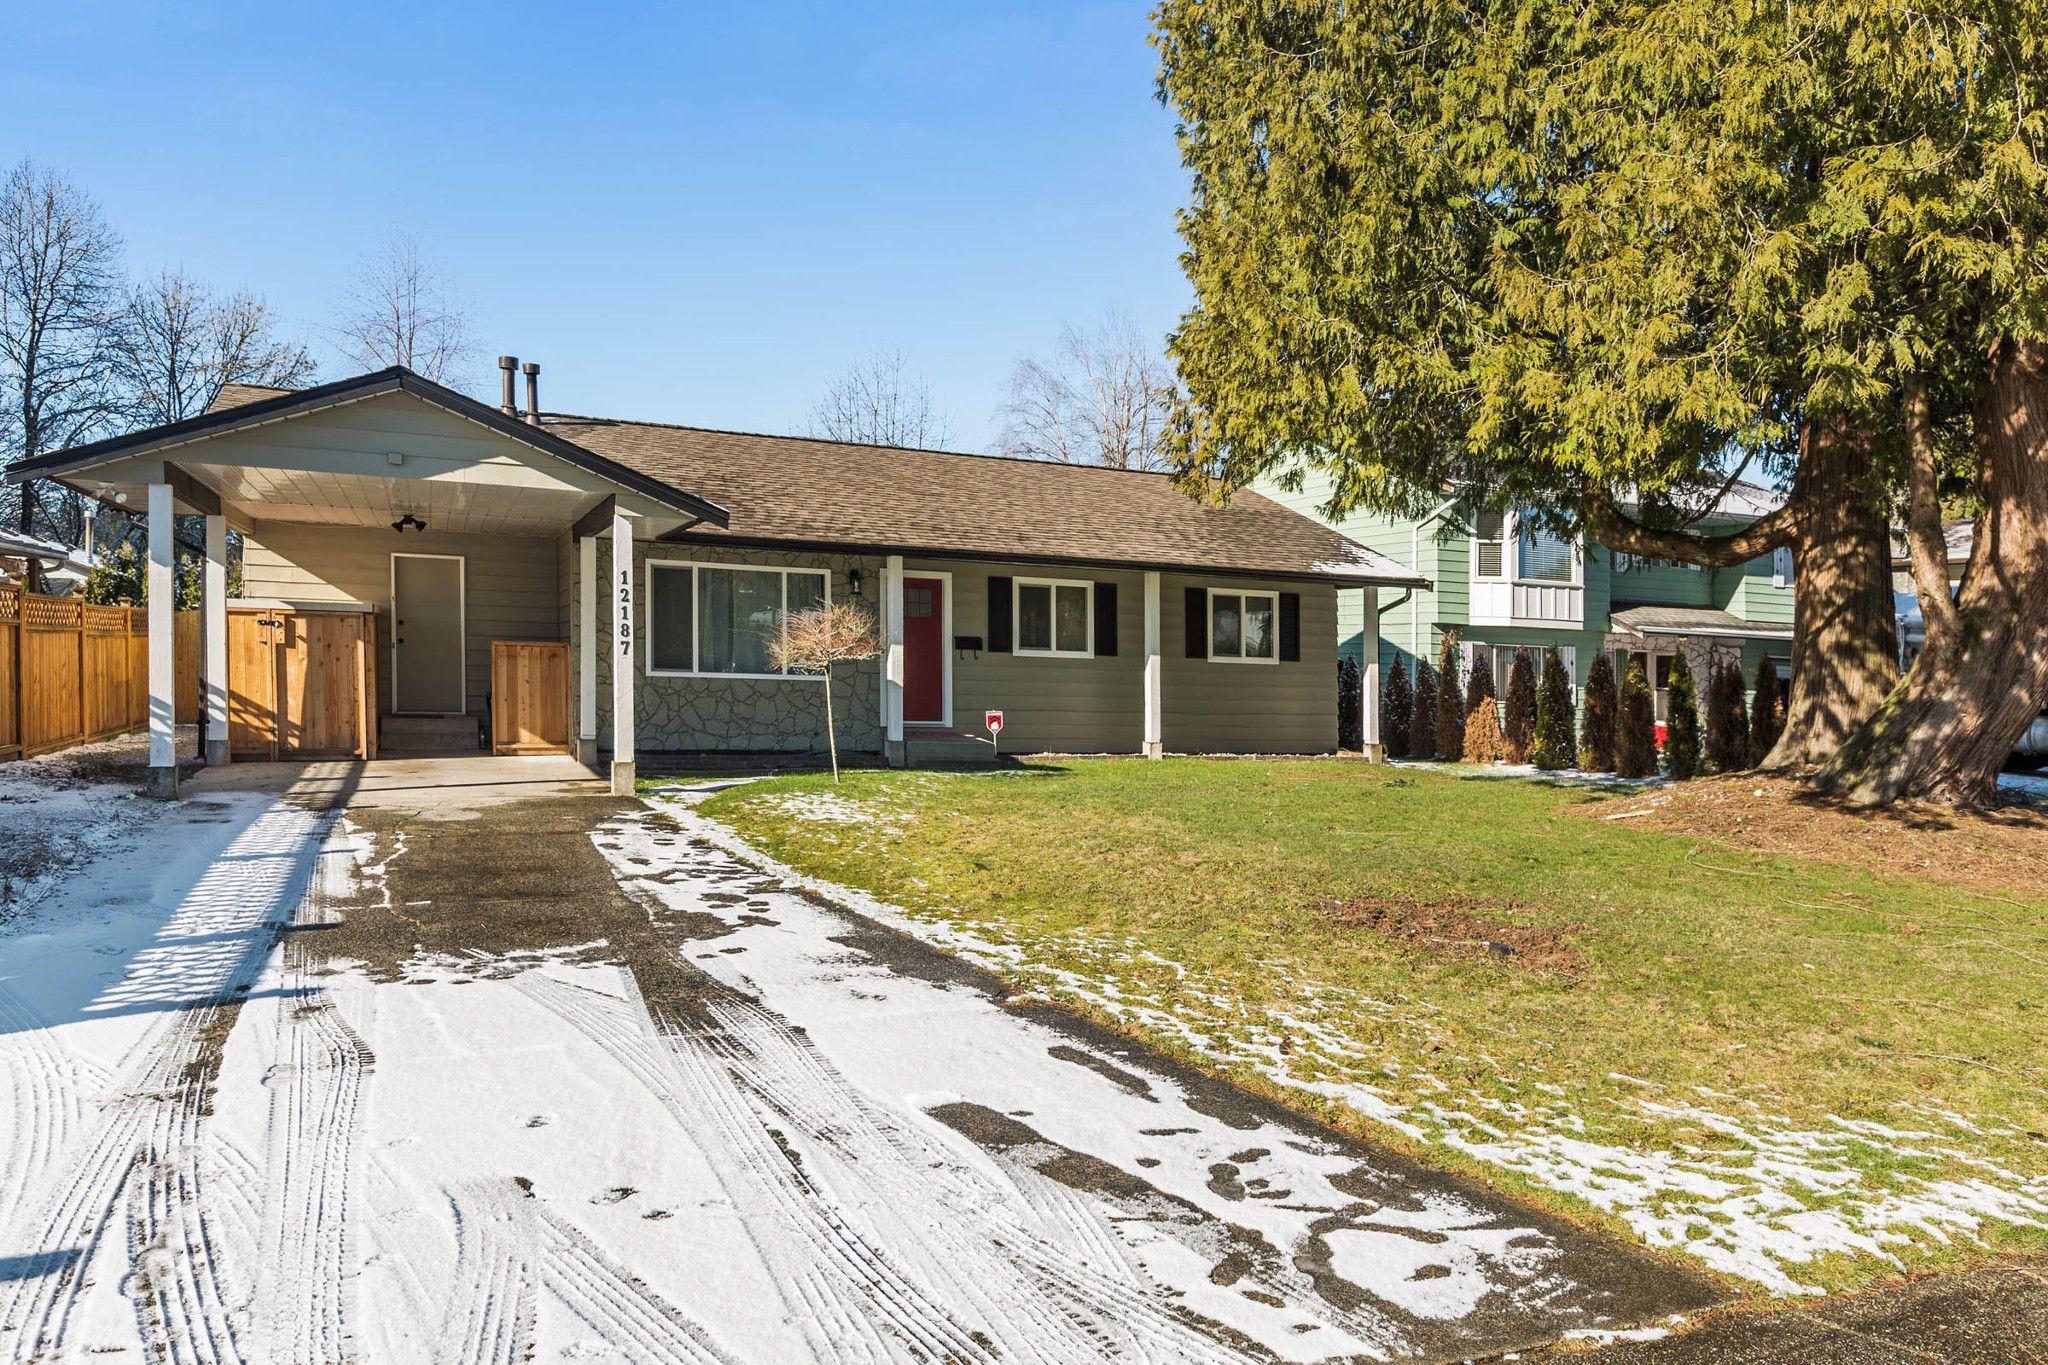 Main Photo: 12187 210 Street in Maple Ridge: Northwest Maple Ridge House for sale : MLS®# R2242183